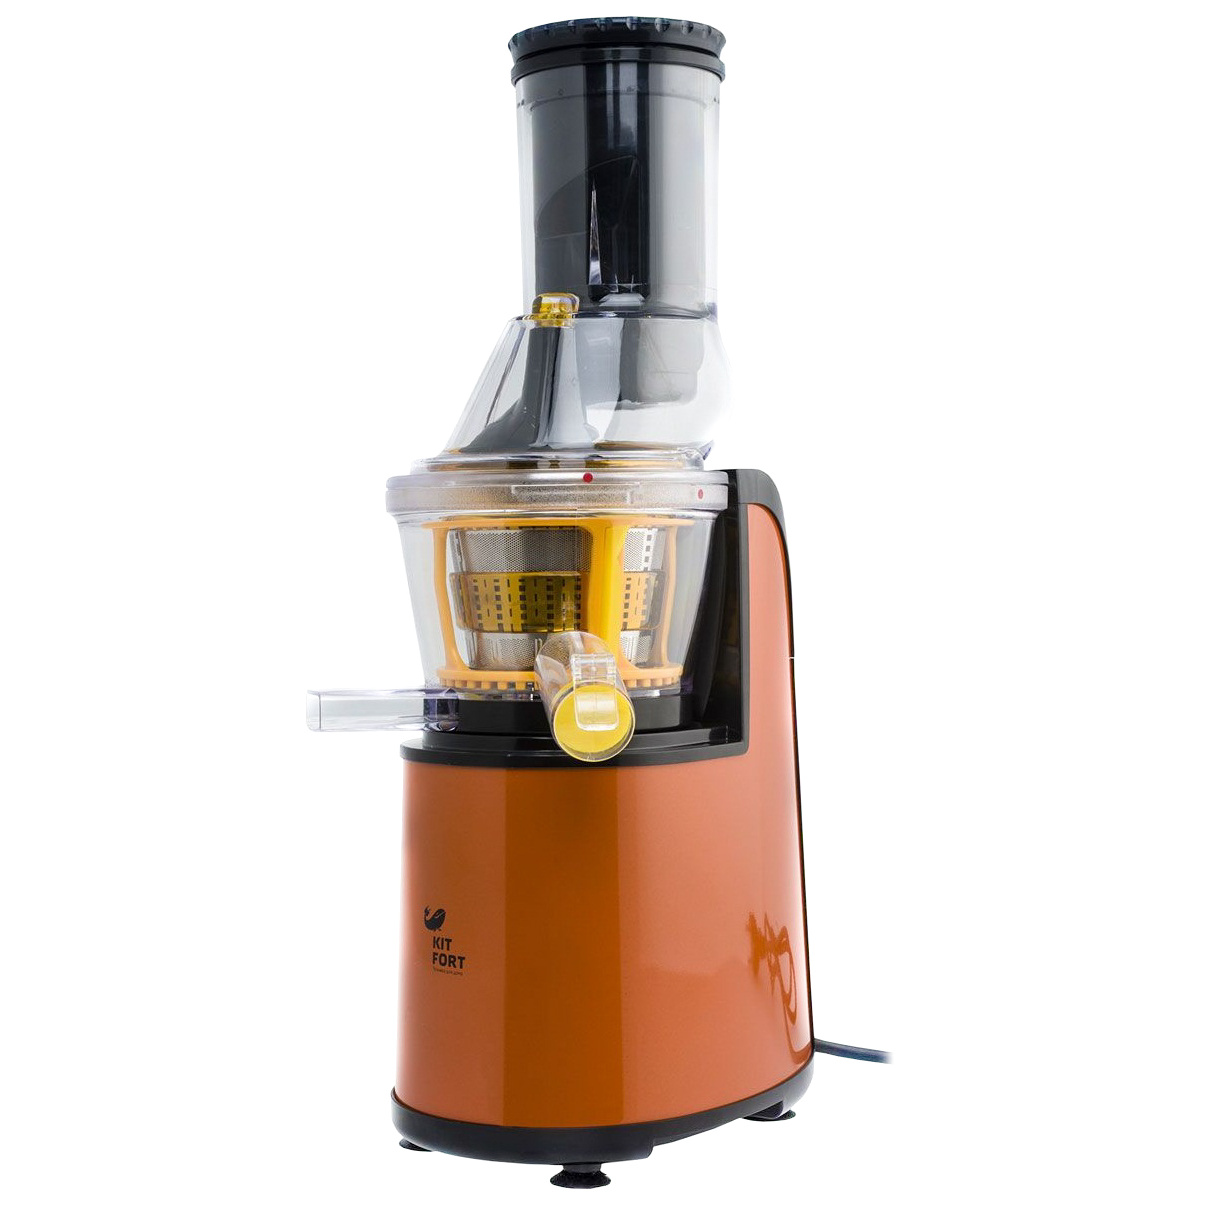 Соковыжималка шнековая Kitfort KT 1102 1 orange